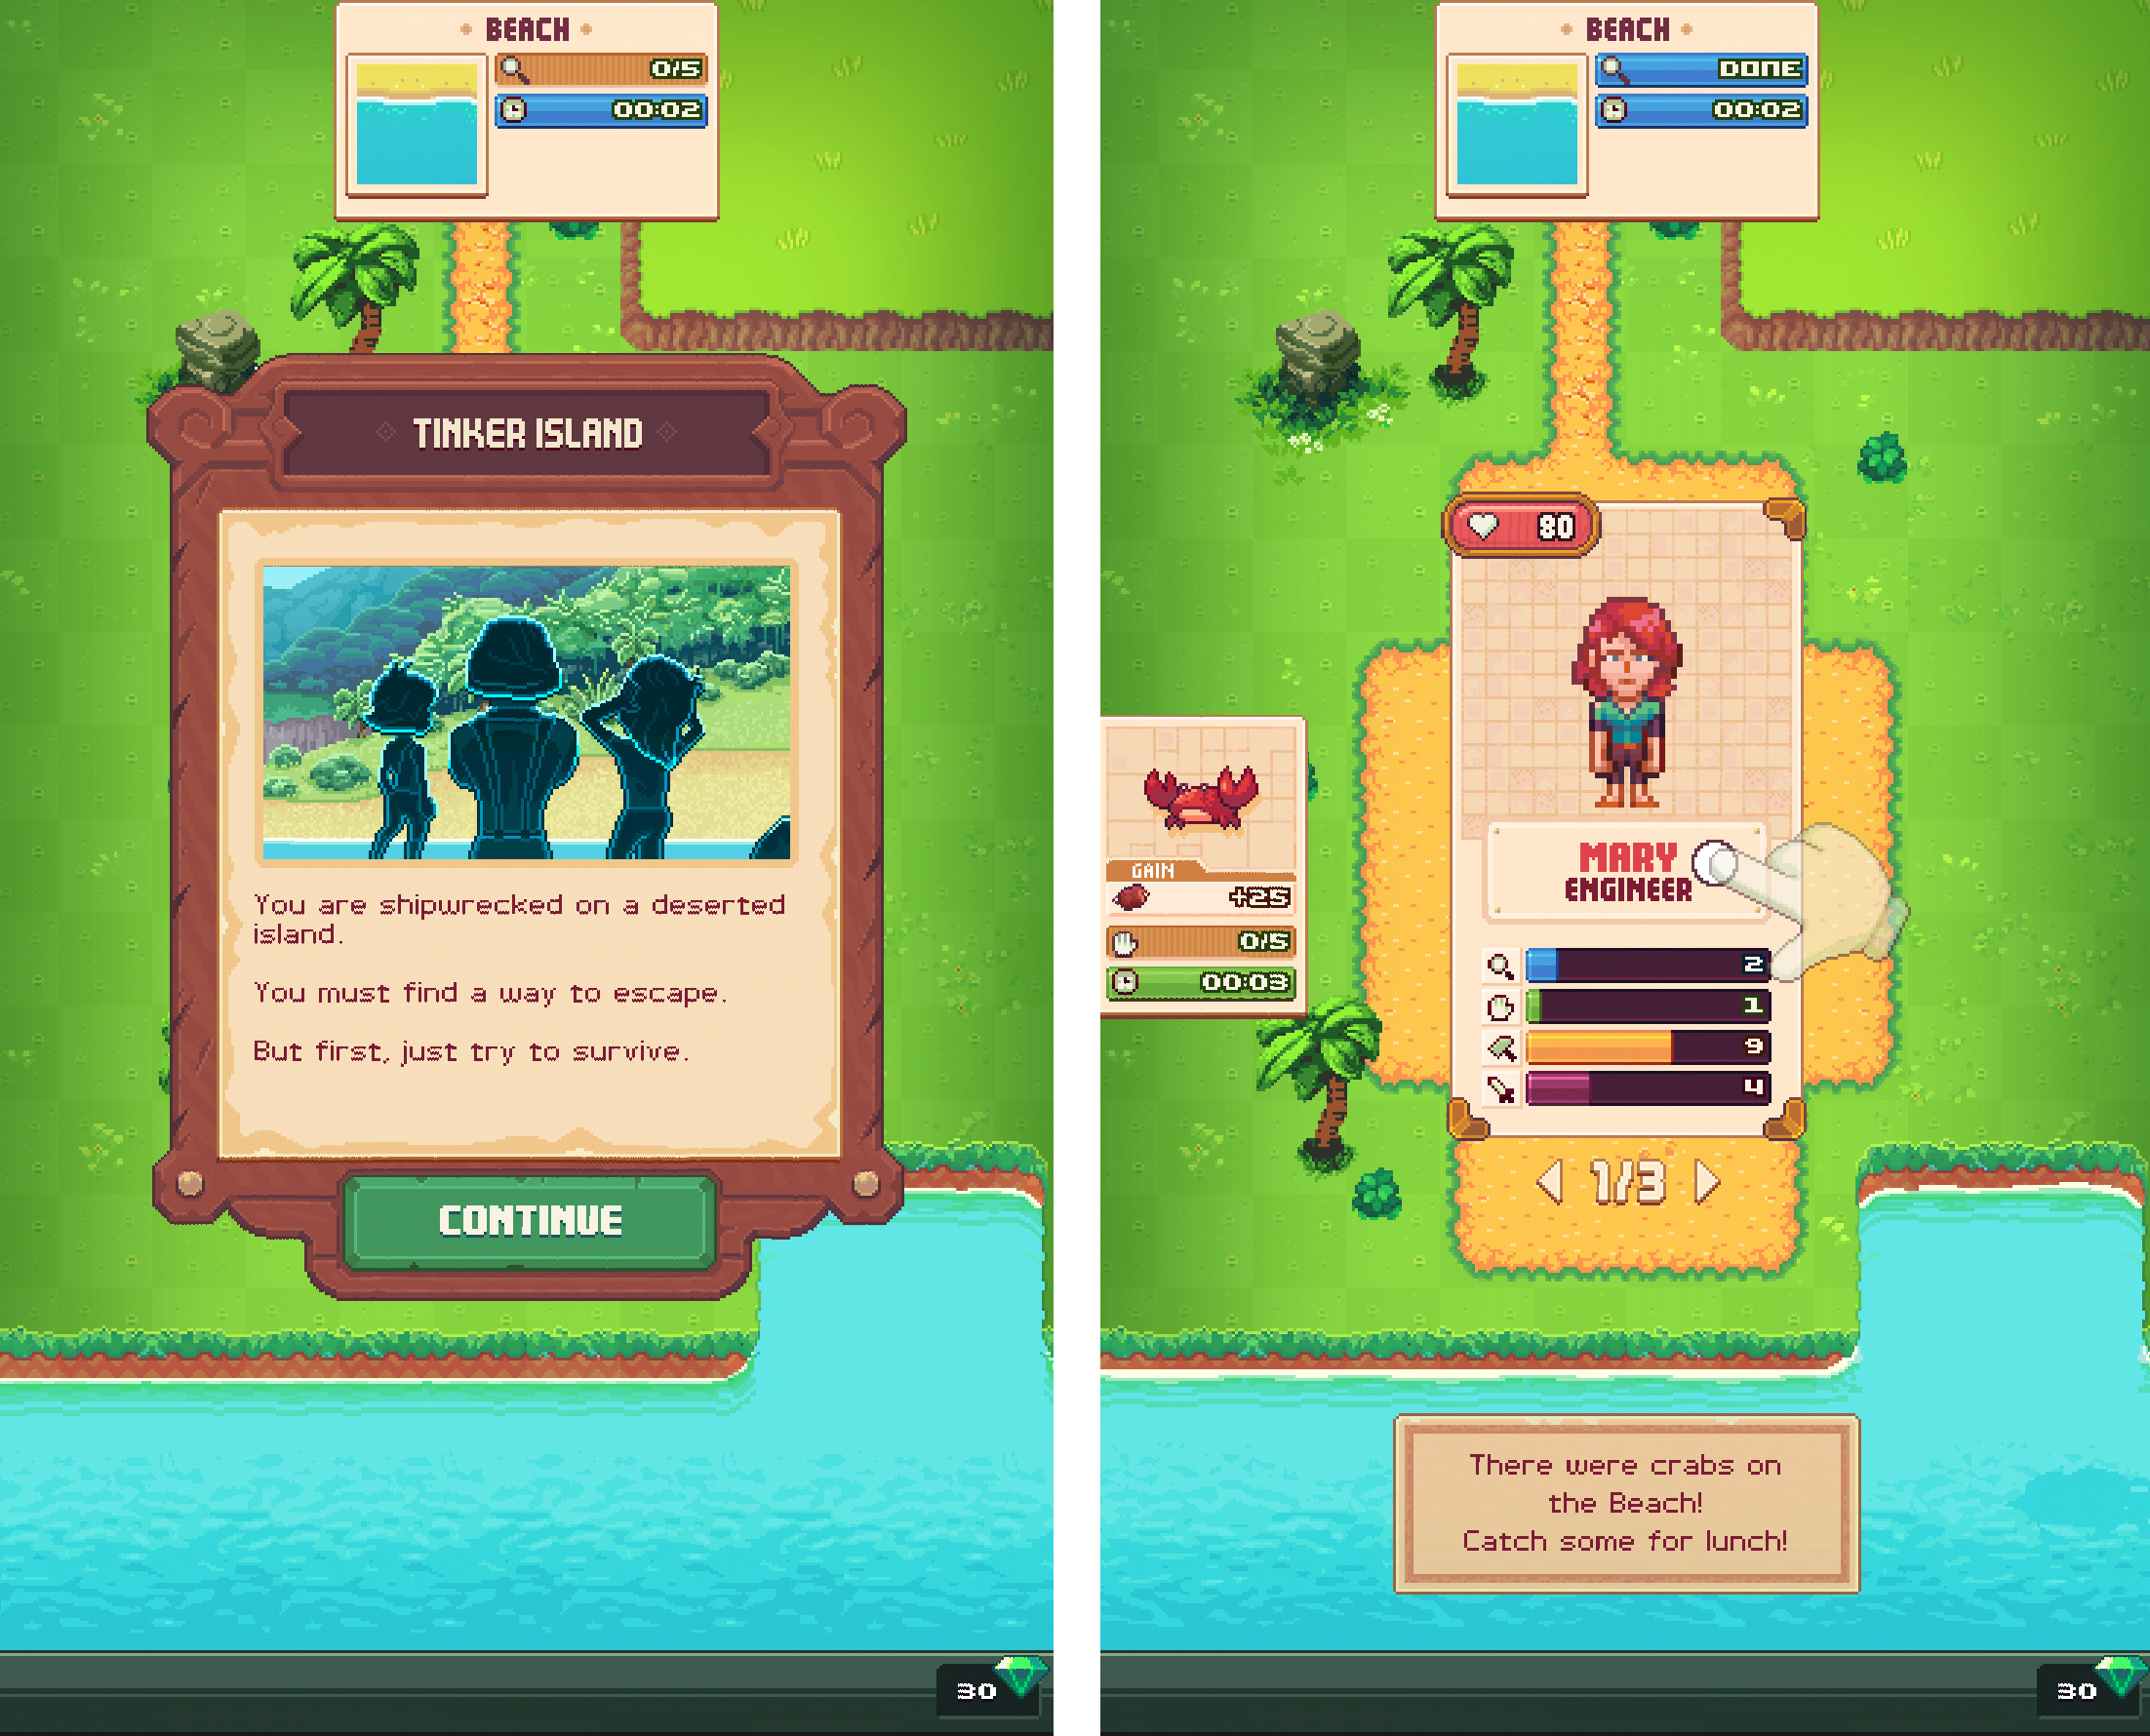 androidアプリ Tinker Island攻略スクリーンショット2